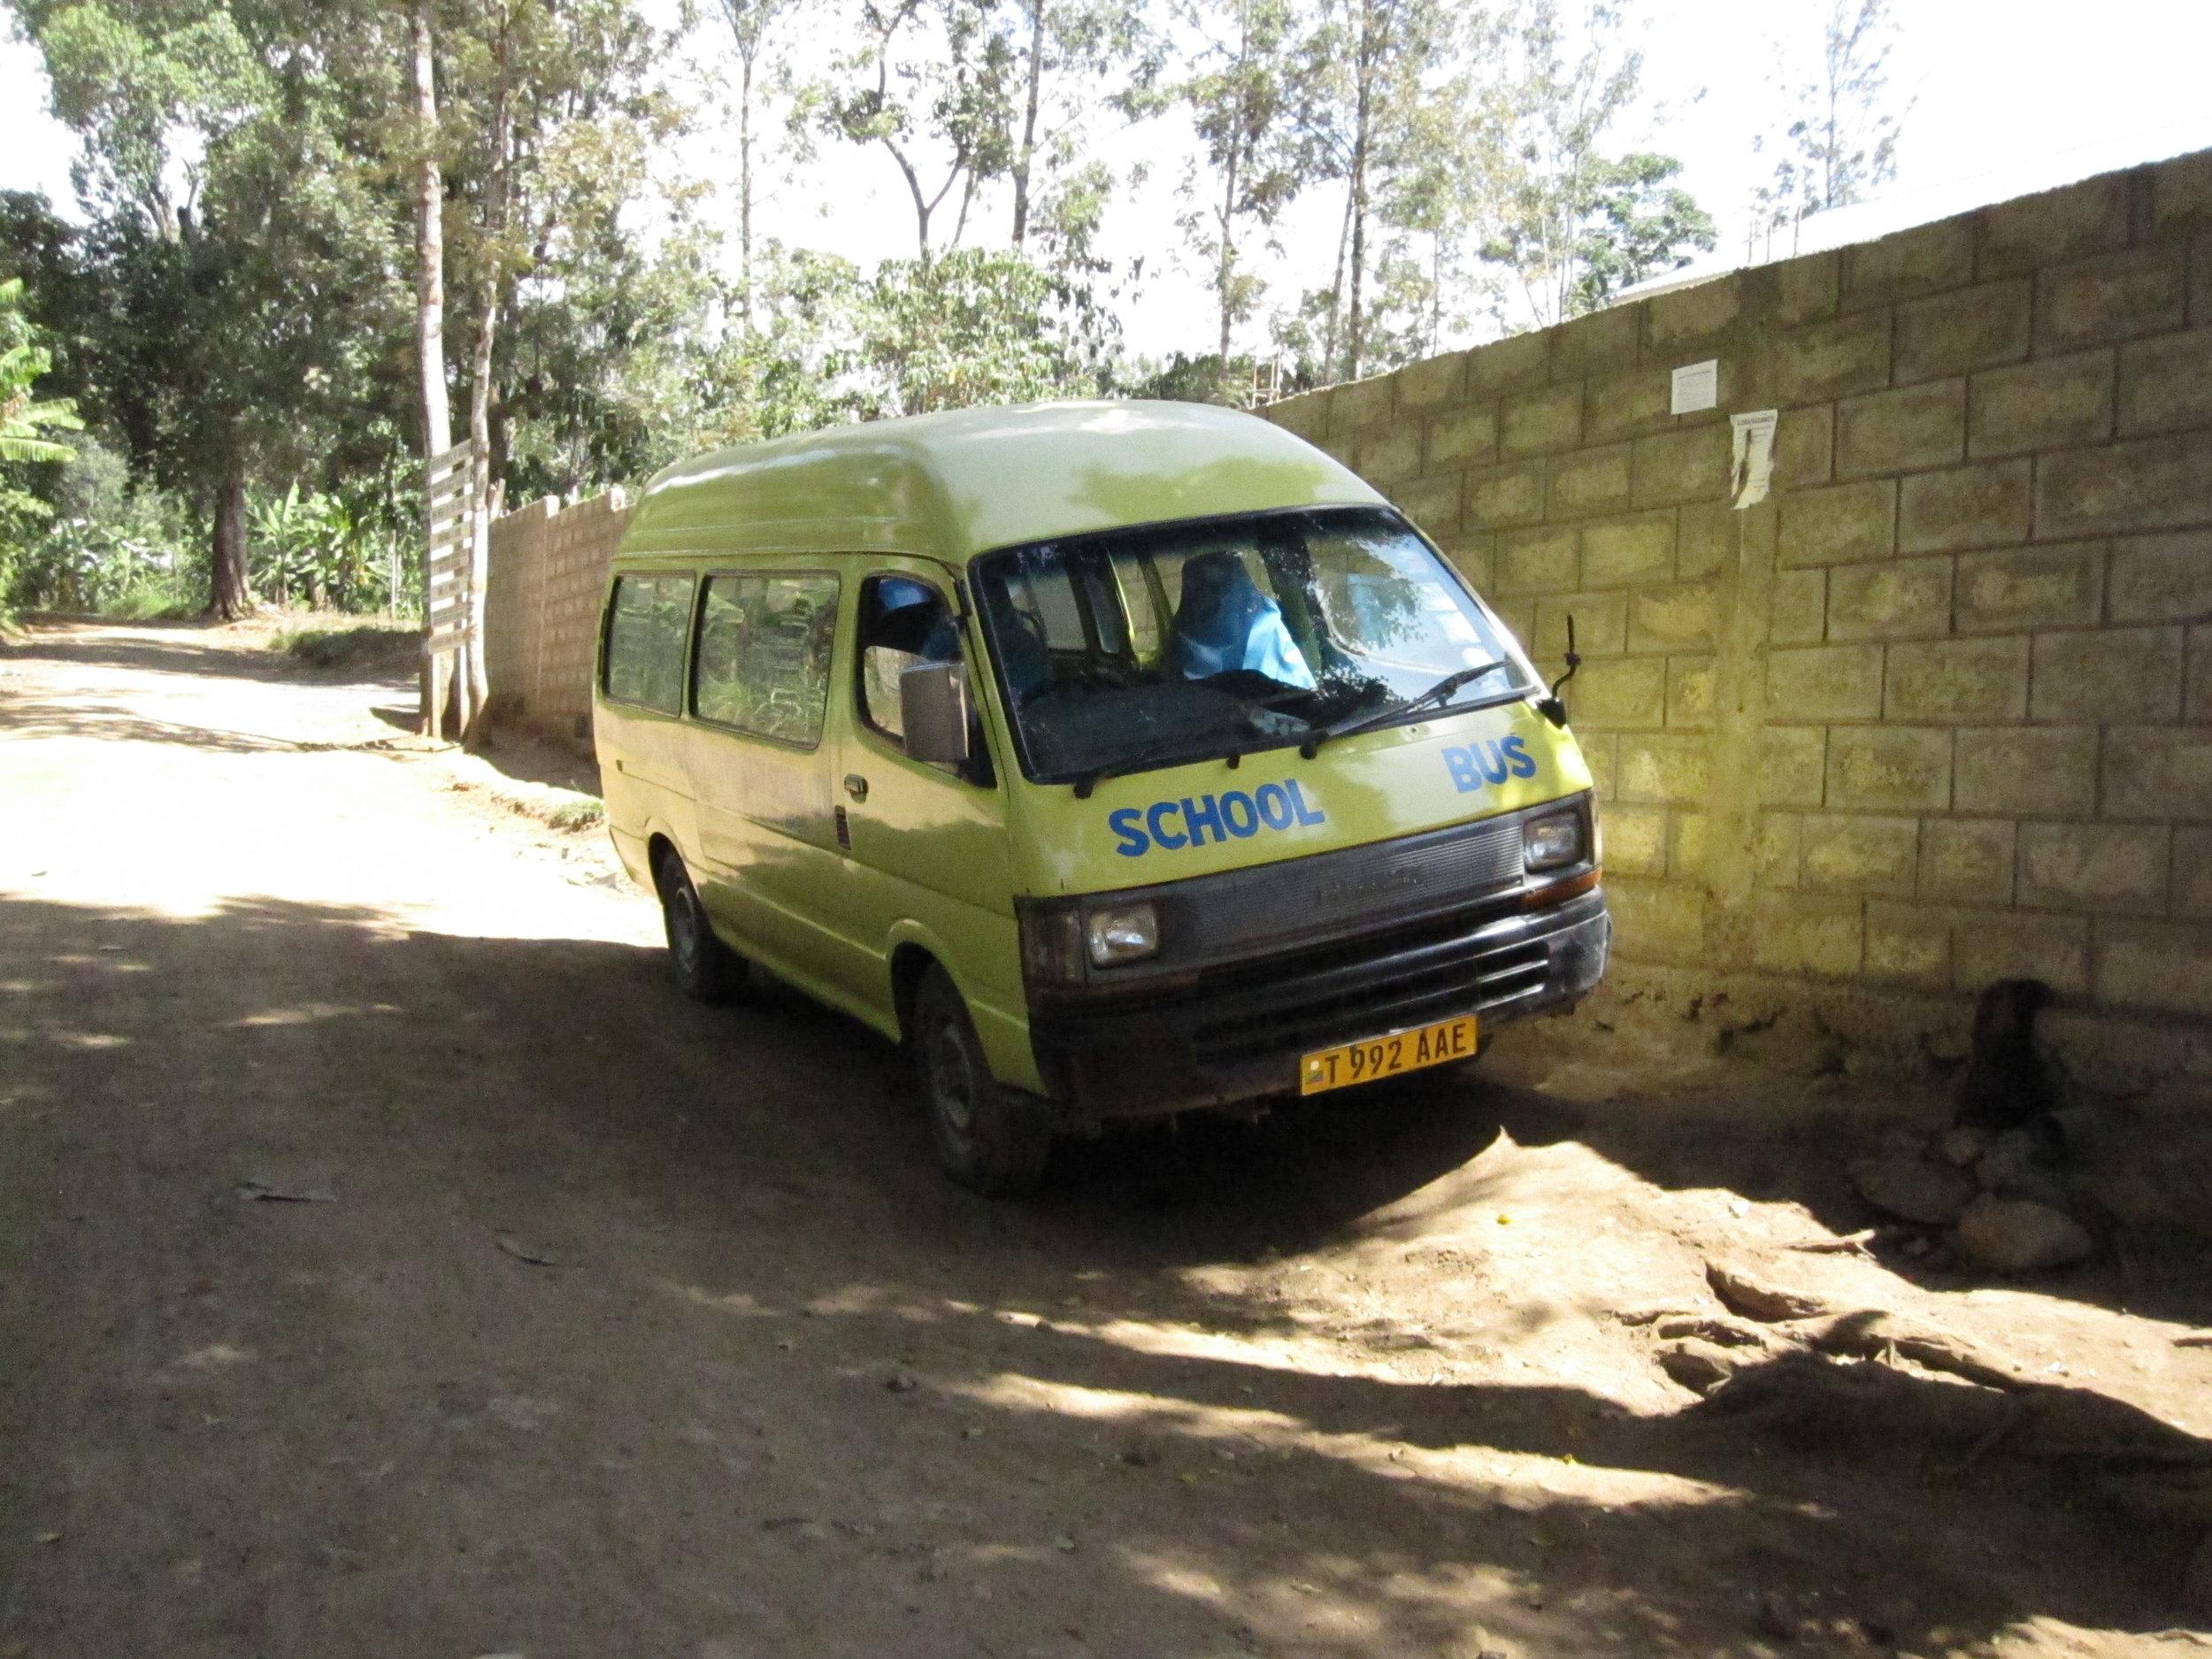 School bus in Tanzania